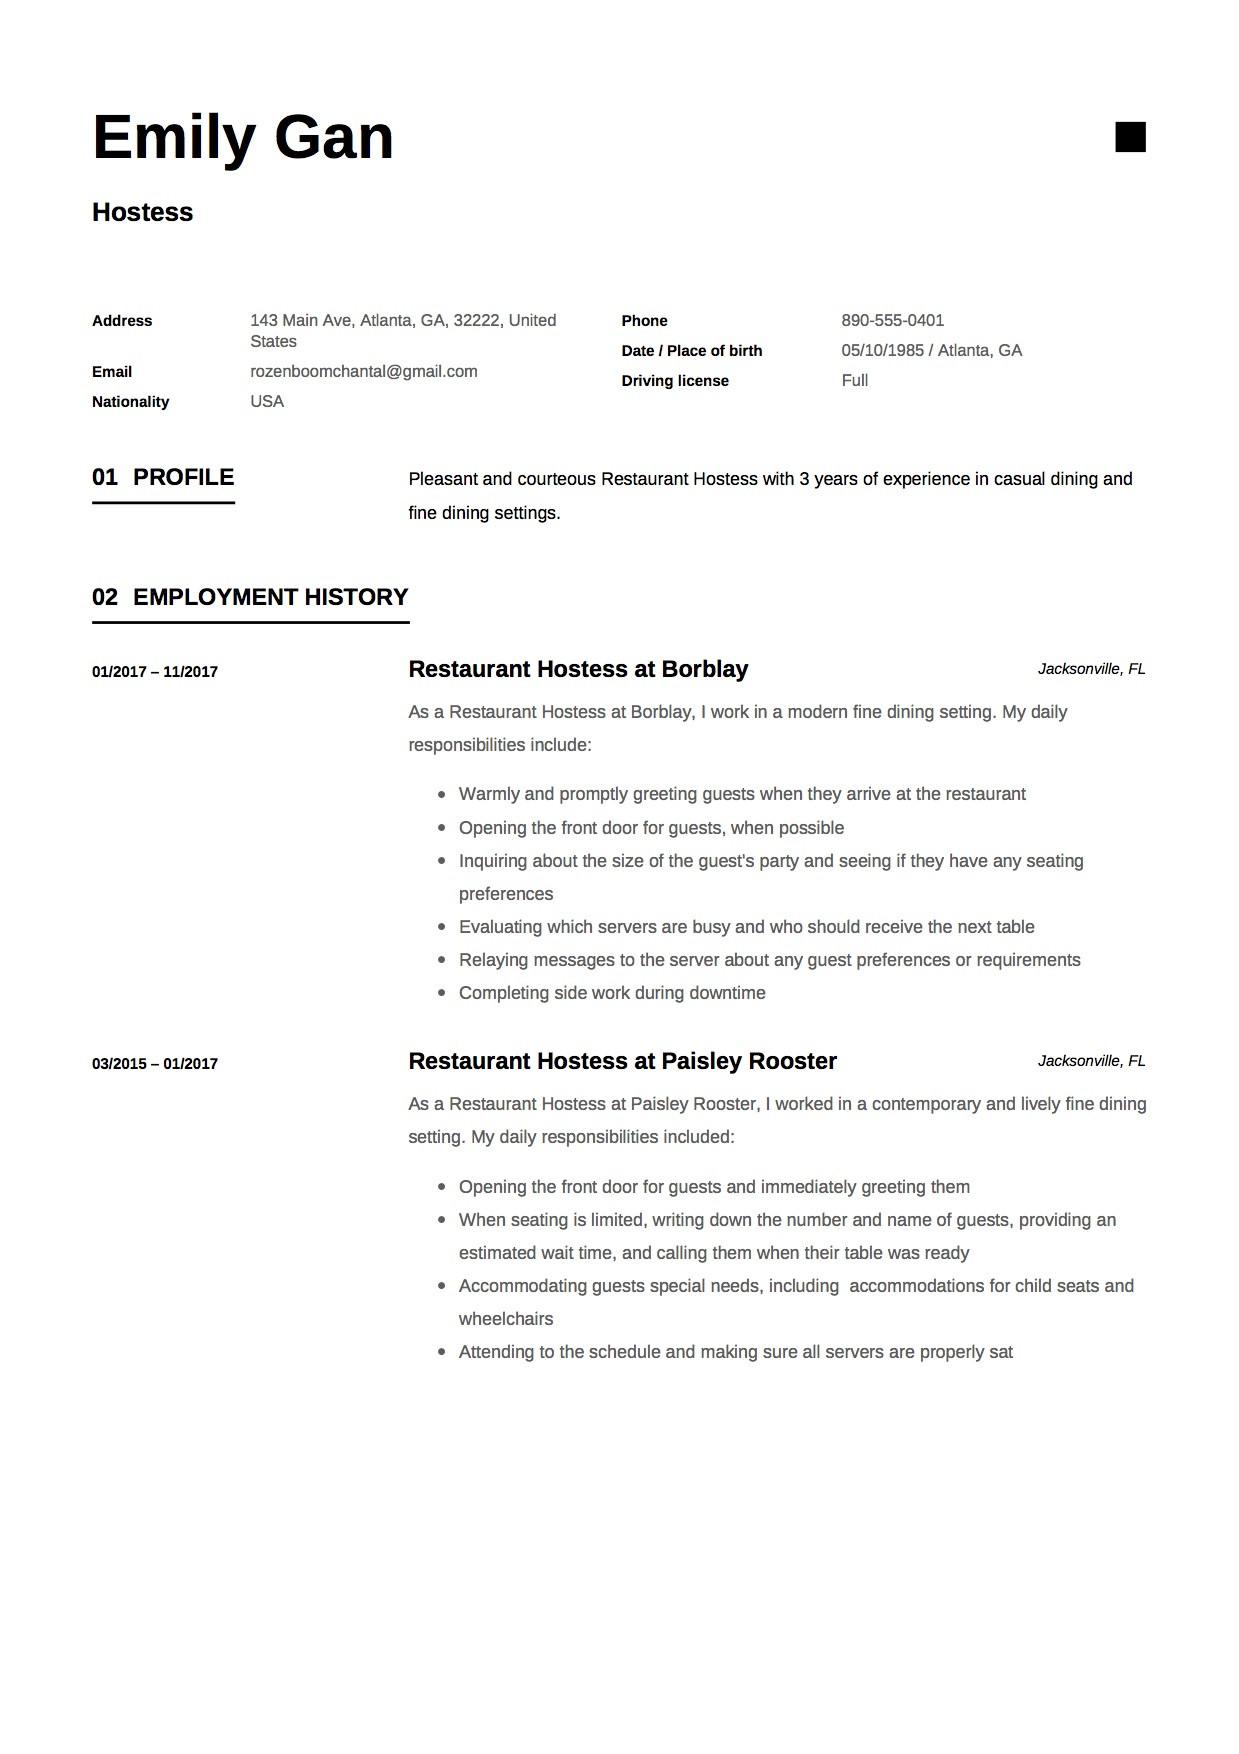 Restaurant Host Job Description Resume Hostess Resume & Guide